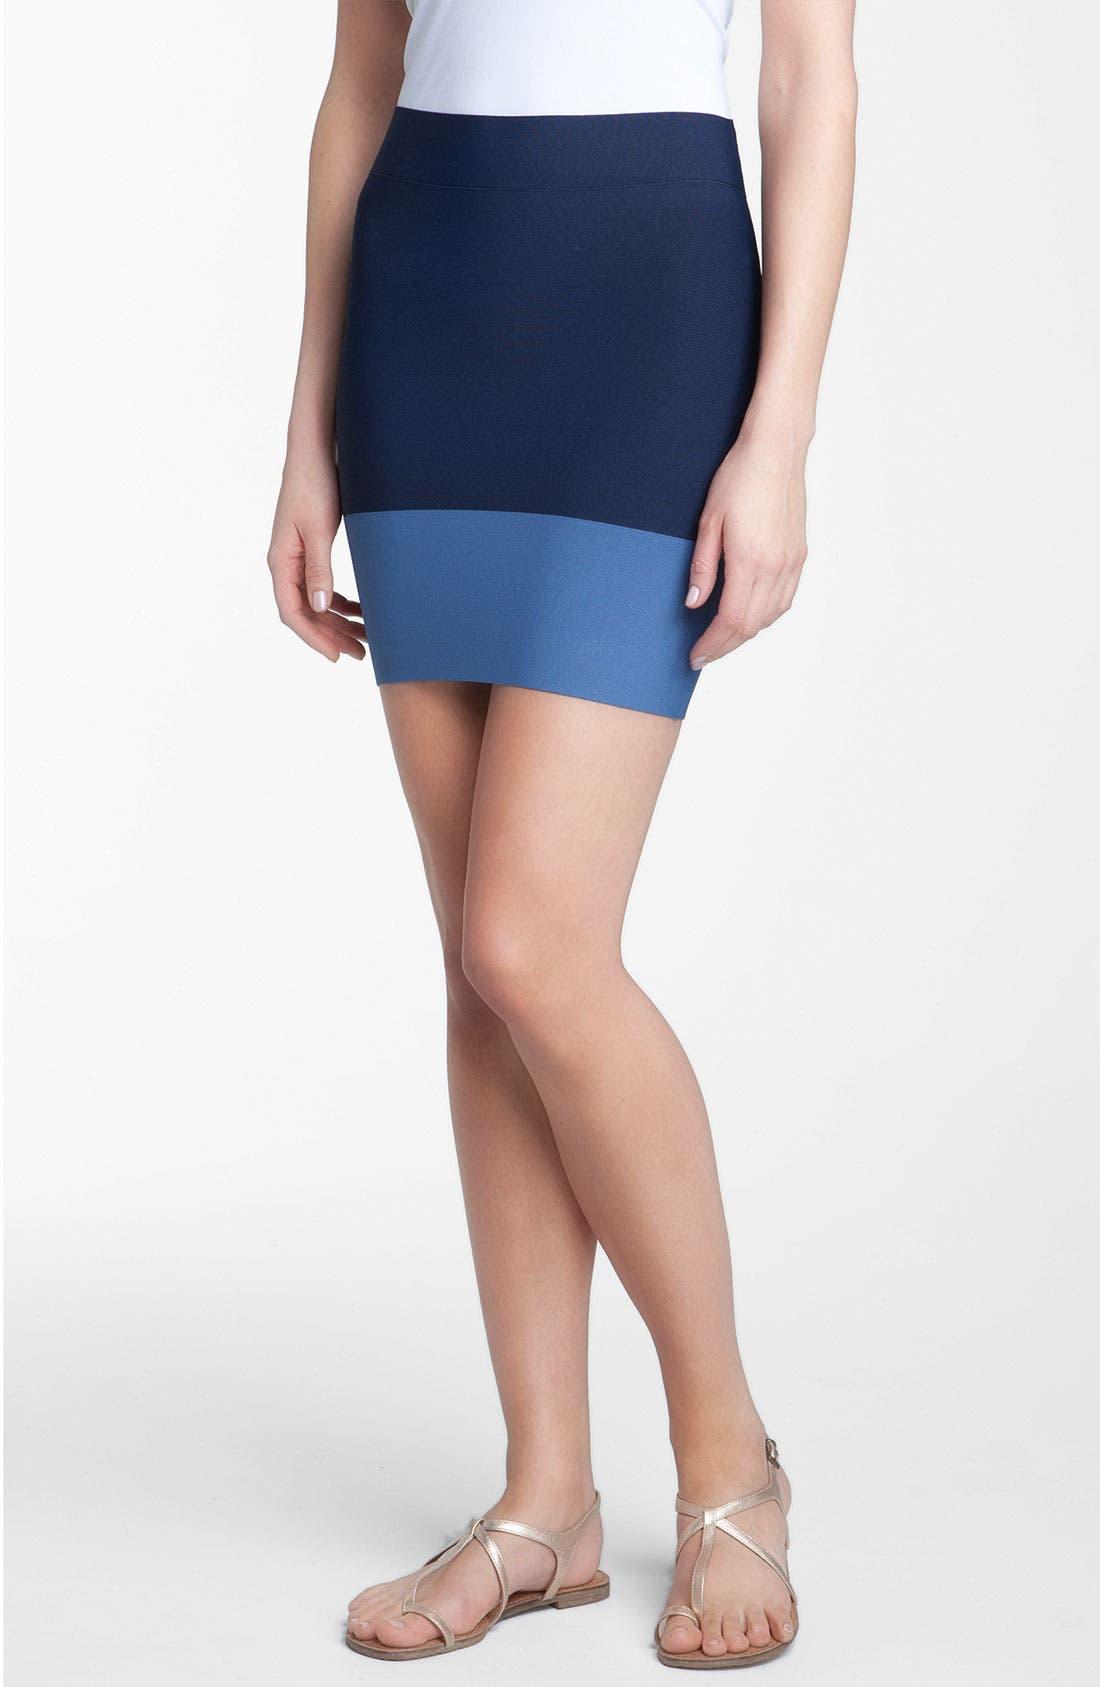 Main Image - BCBGMAXAZRIA Colorblock Bandage Skirt